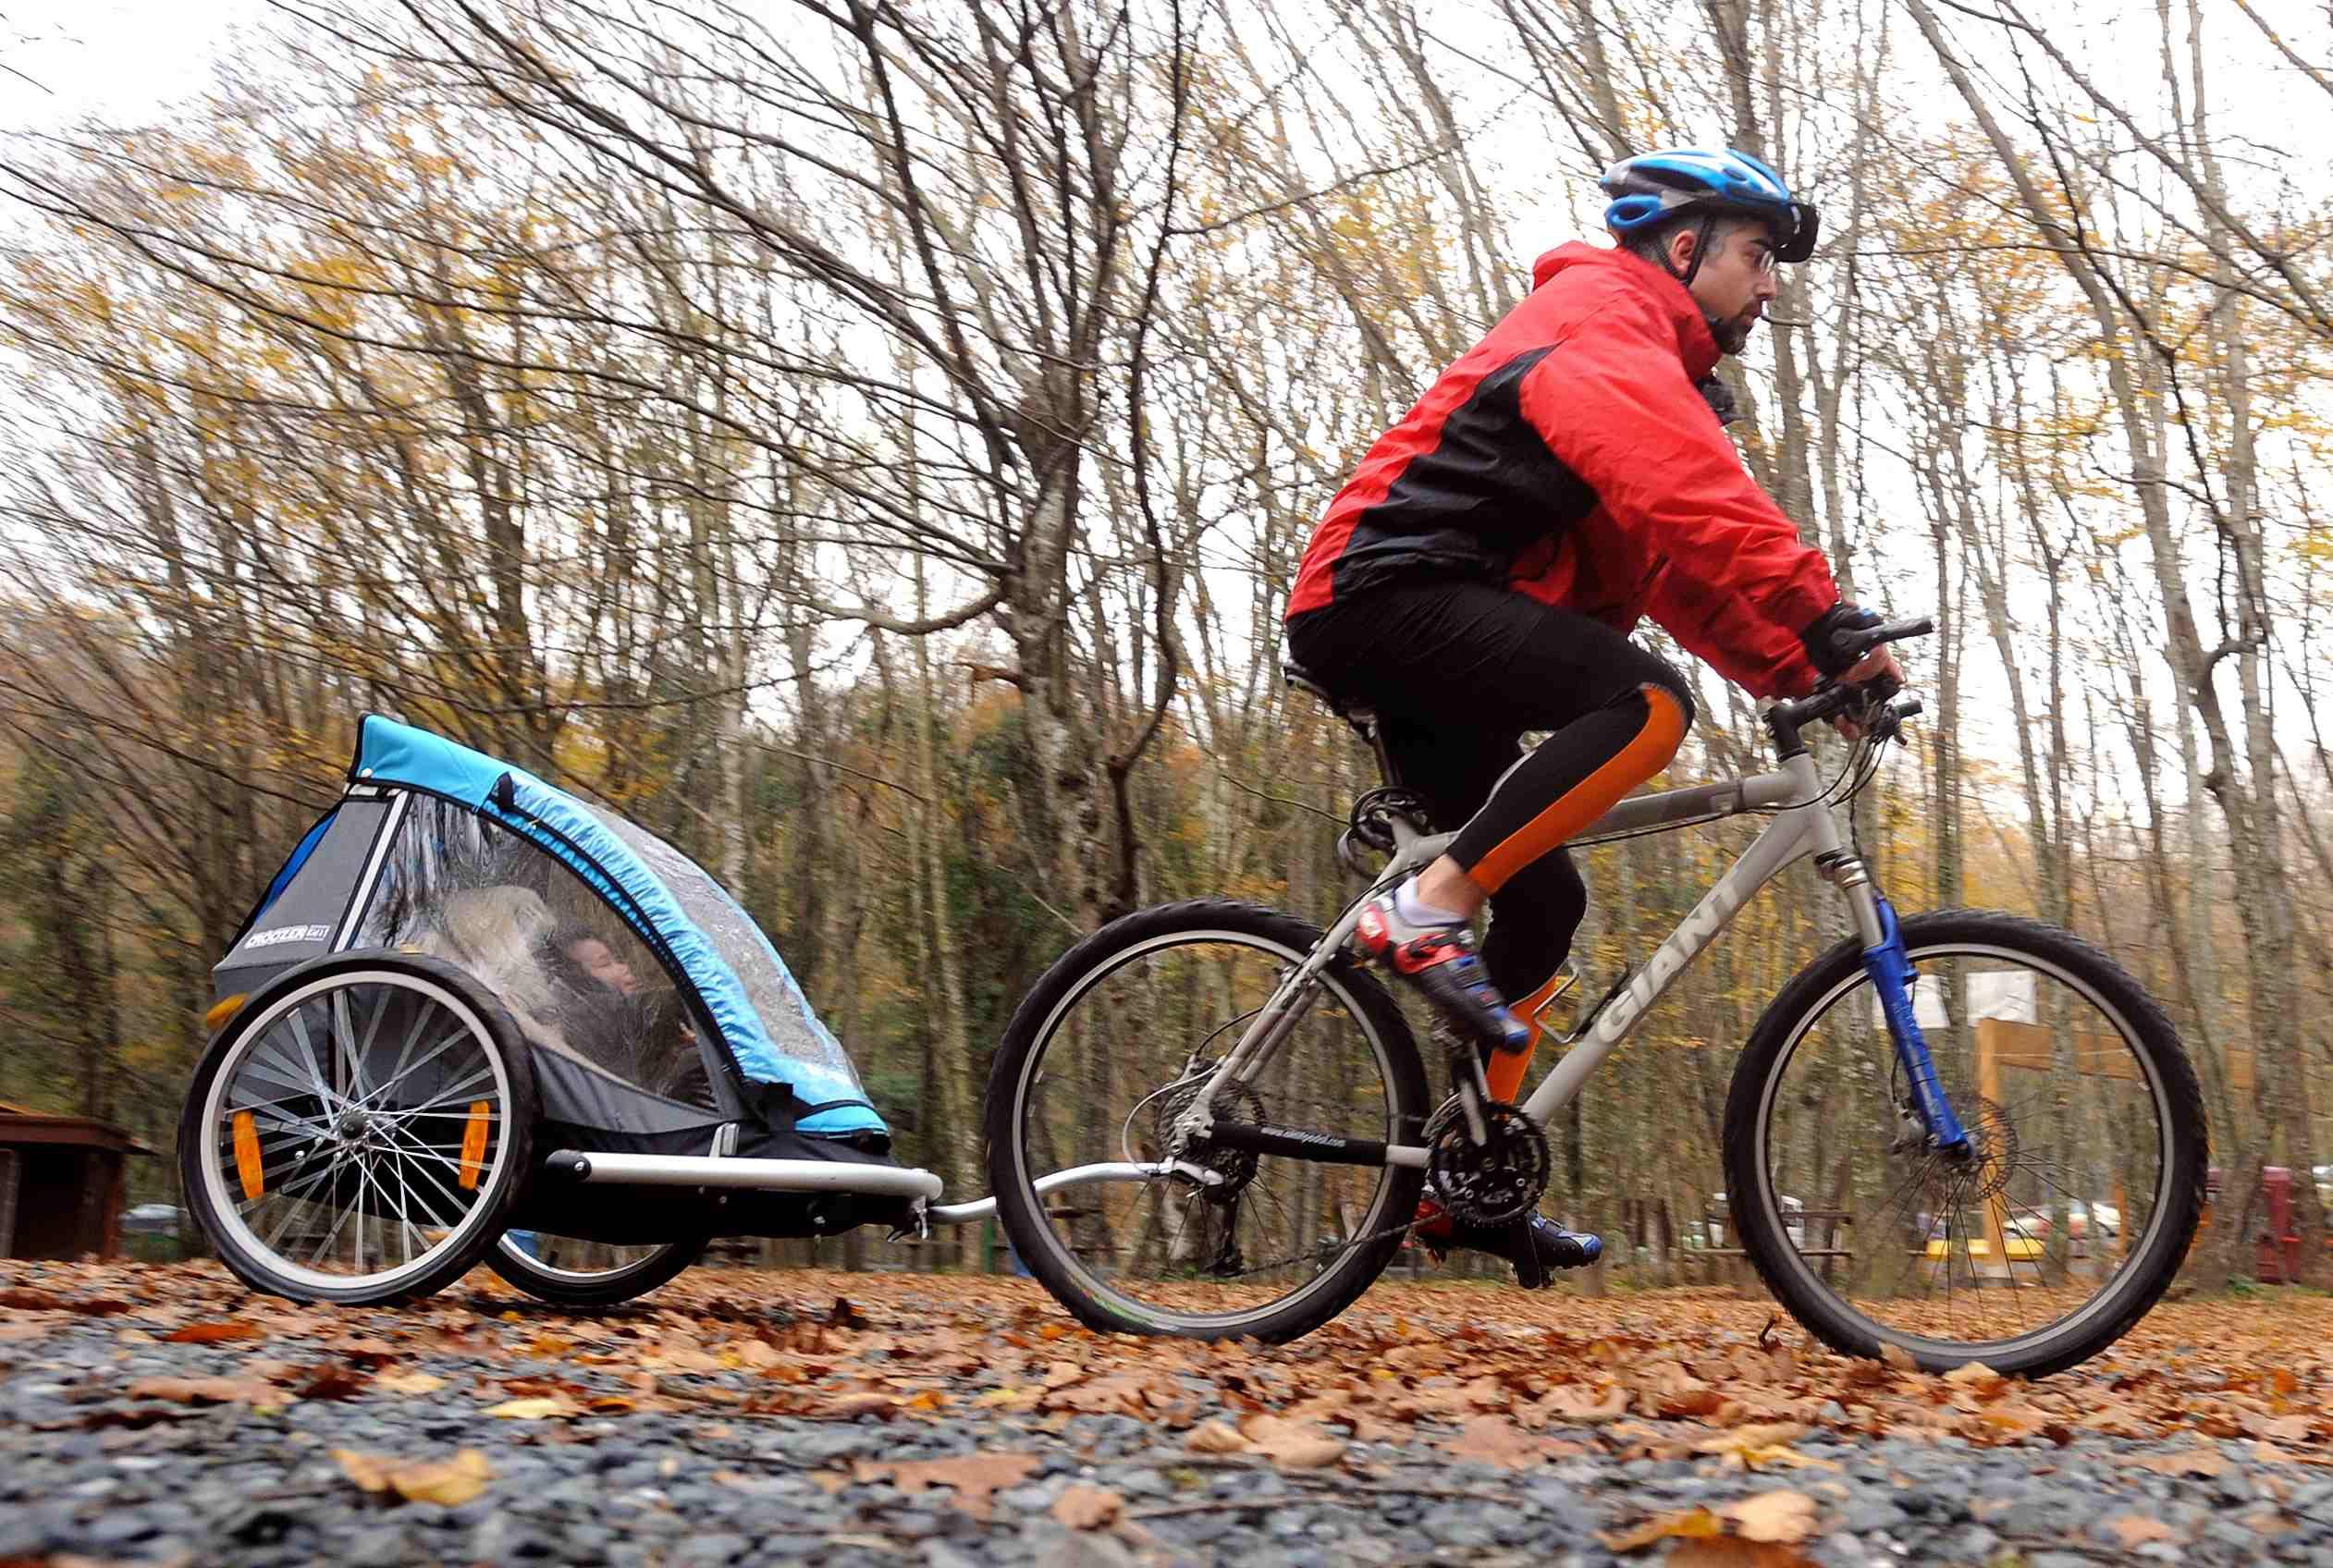 Belgrad ormanlarında bisiklete binerken